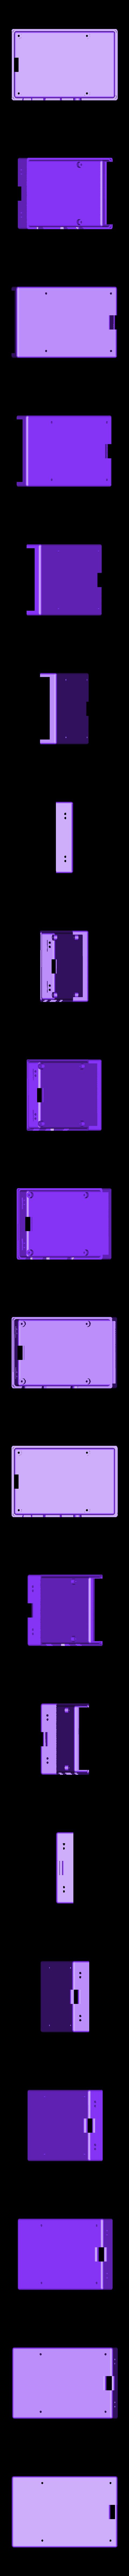 Pi_Snug_Case_Bottom.stl Download free STL file Raspberry Pi Snug Case • 3D printable design, Aralala